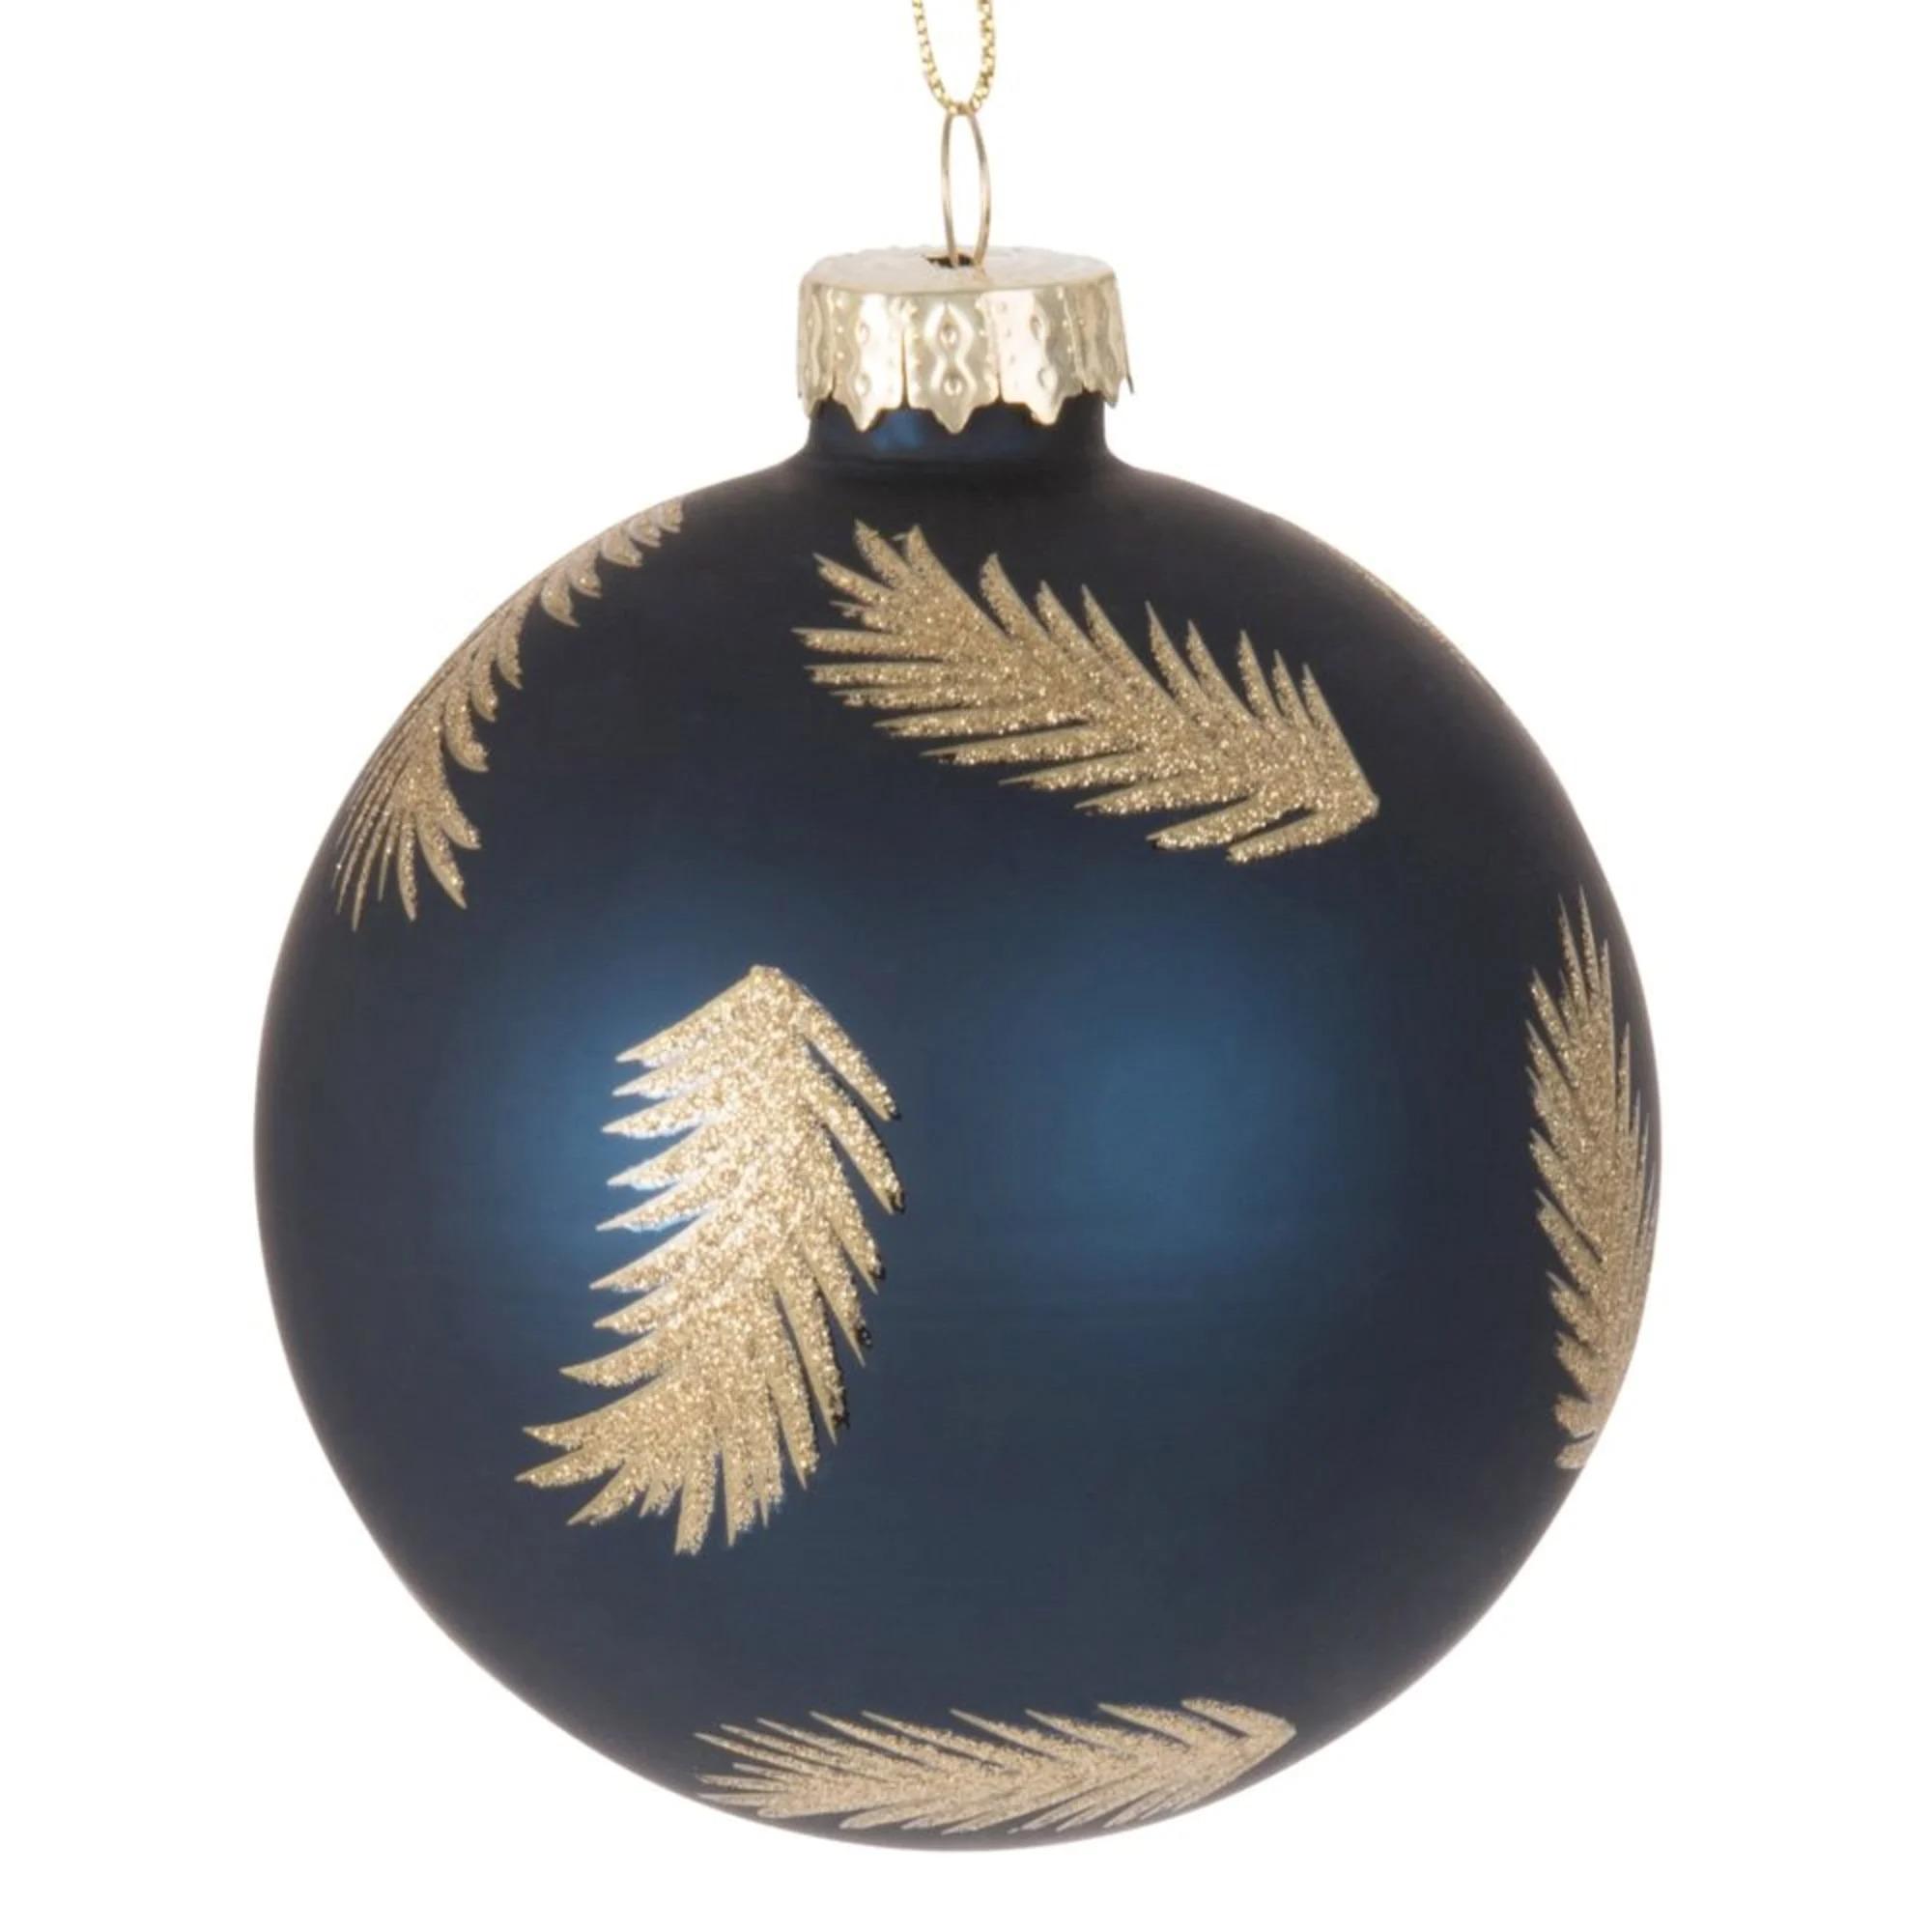 Bola de Navidad de cristal tintado azul con motivos de plumas de purpurina dorada - Lote de 6